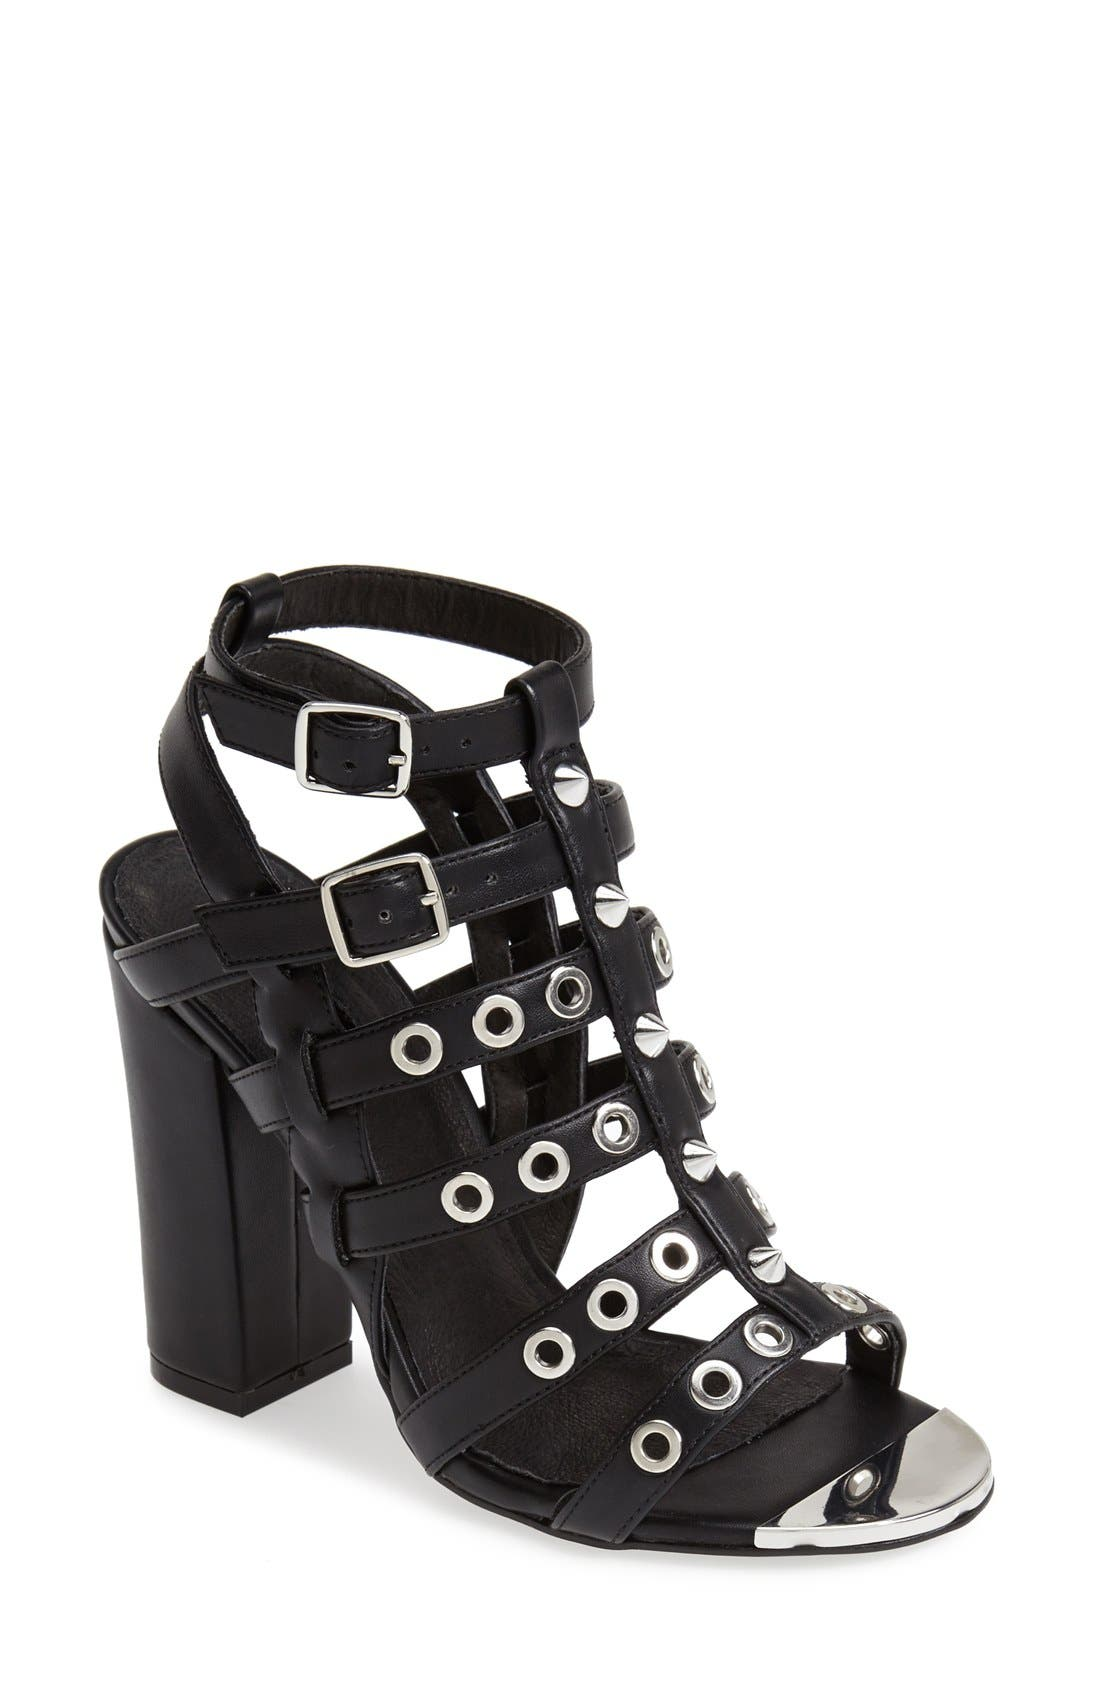 Alternate Image 1 Selected - Topshop 'Roxy' Gladiator Sandal (Women)